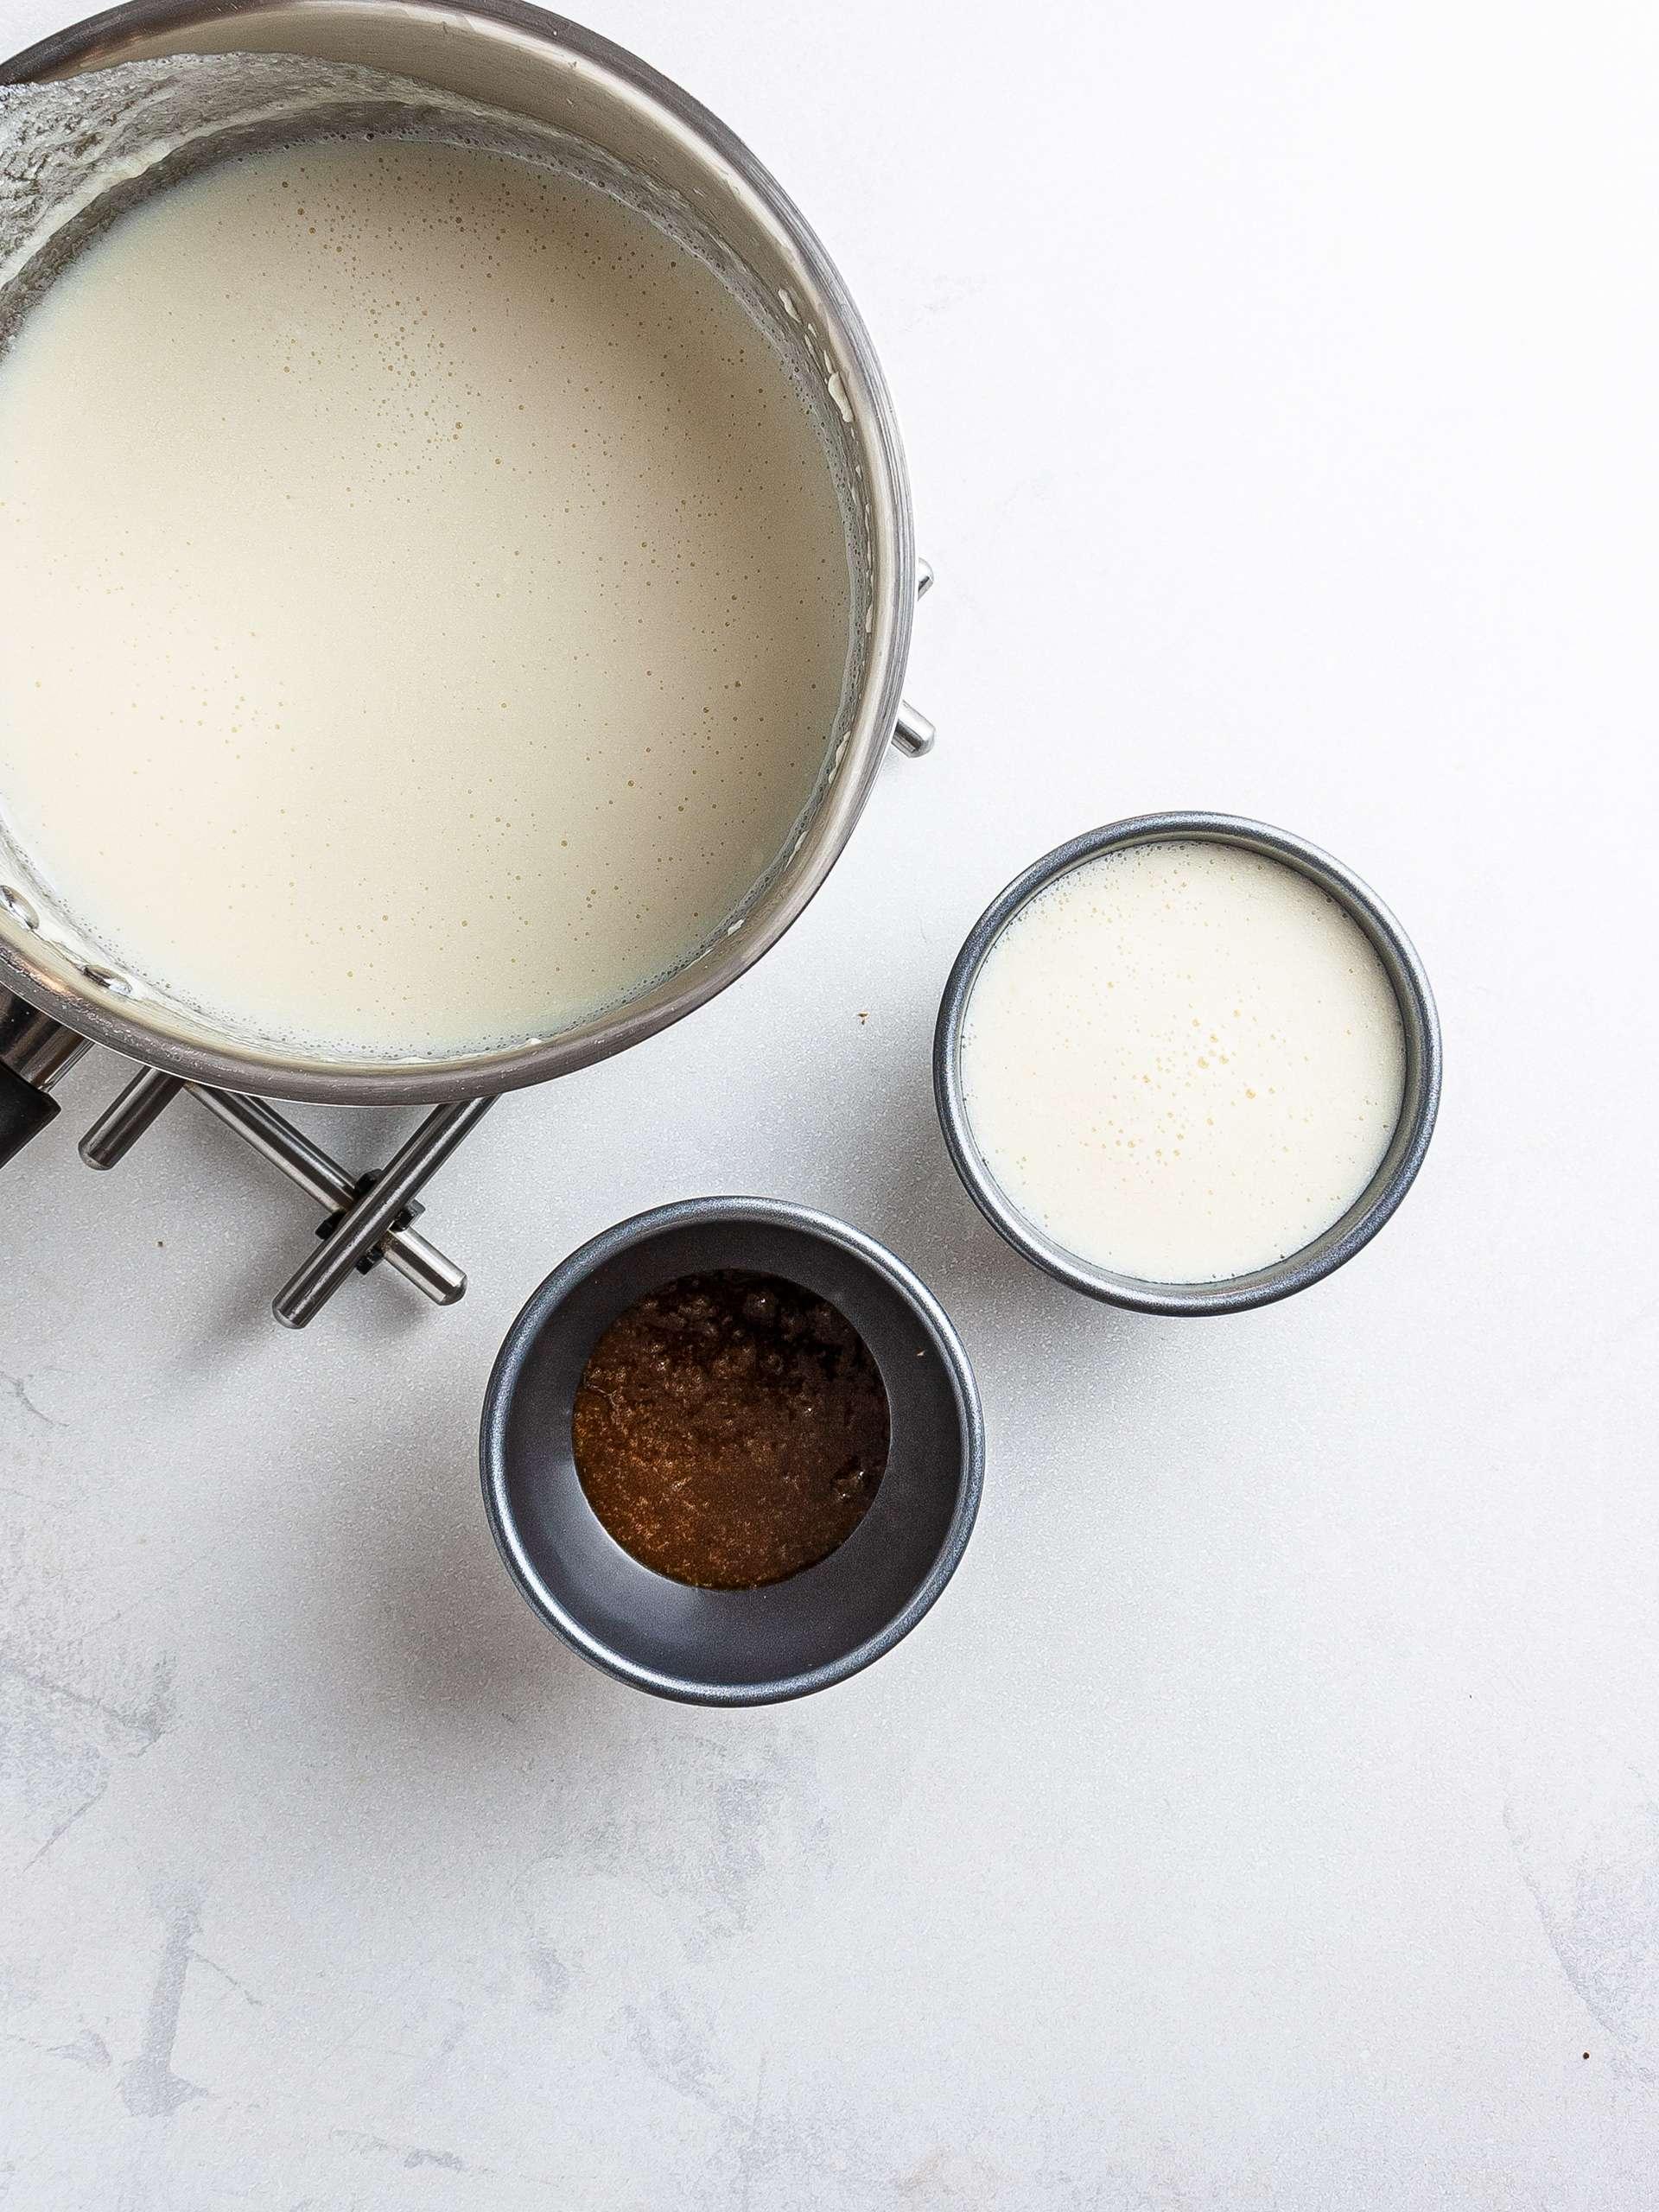 Pudding layer in the ramekins